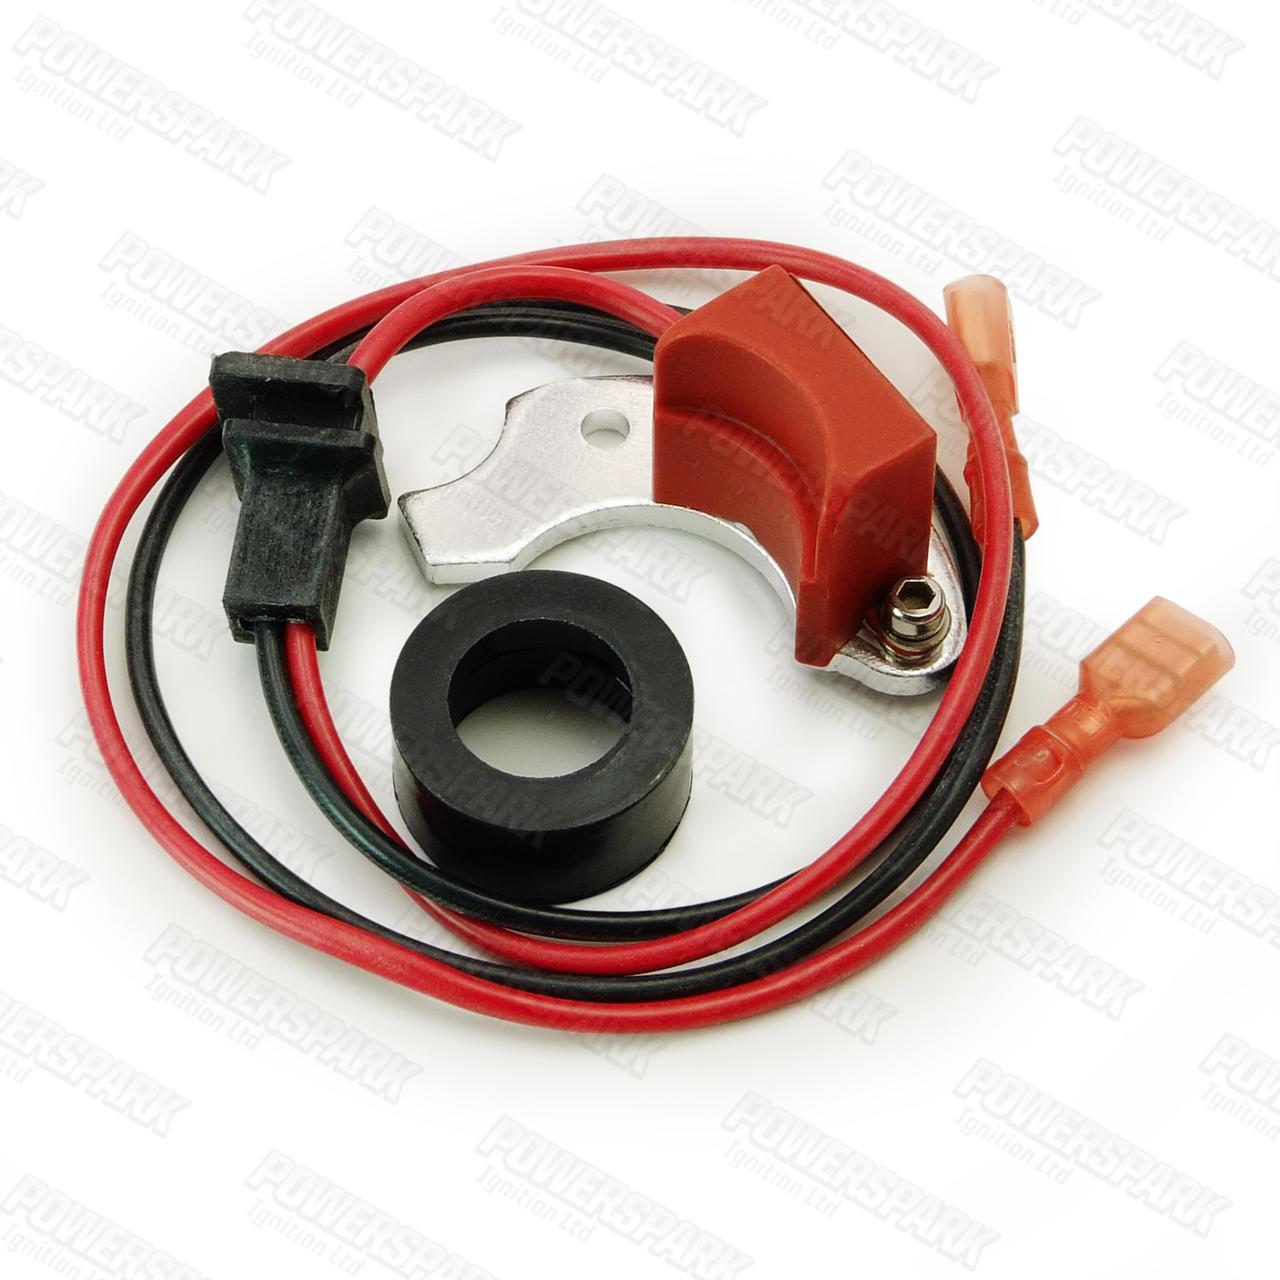 Powerspark Powerspark Electronic Ignition Kit for Lucas 45D, 43D, 59D Distributor 24 Volt K4_24v and R2